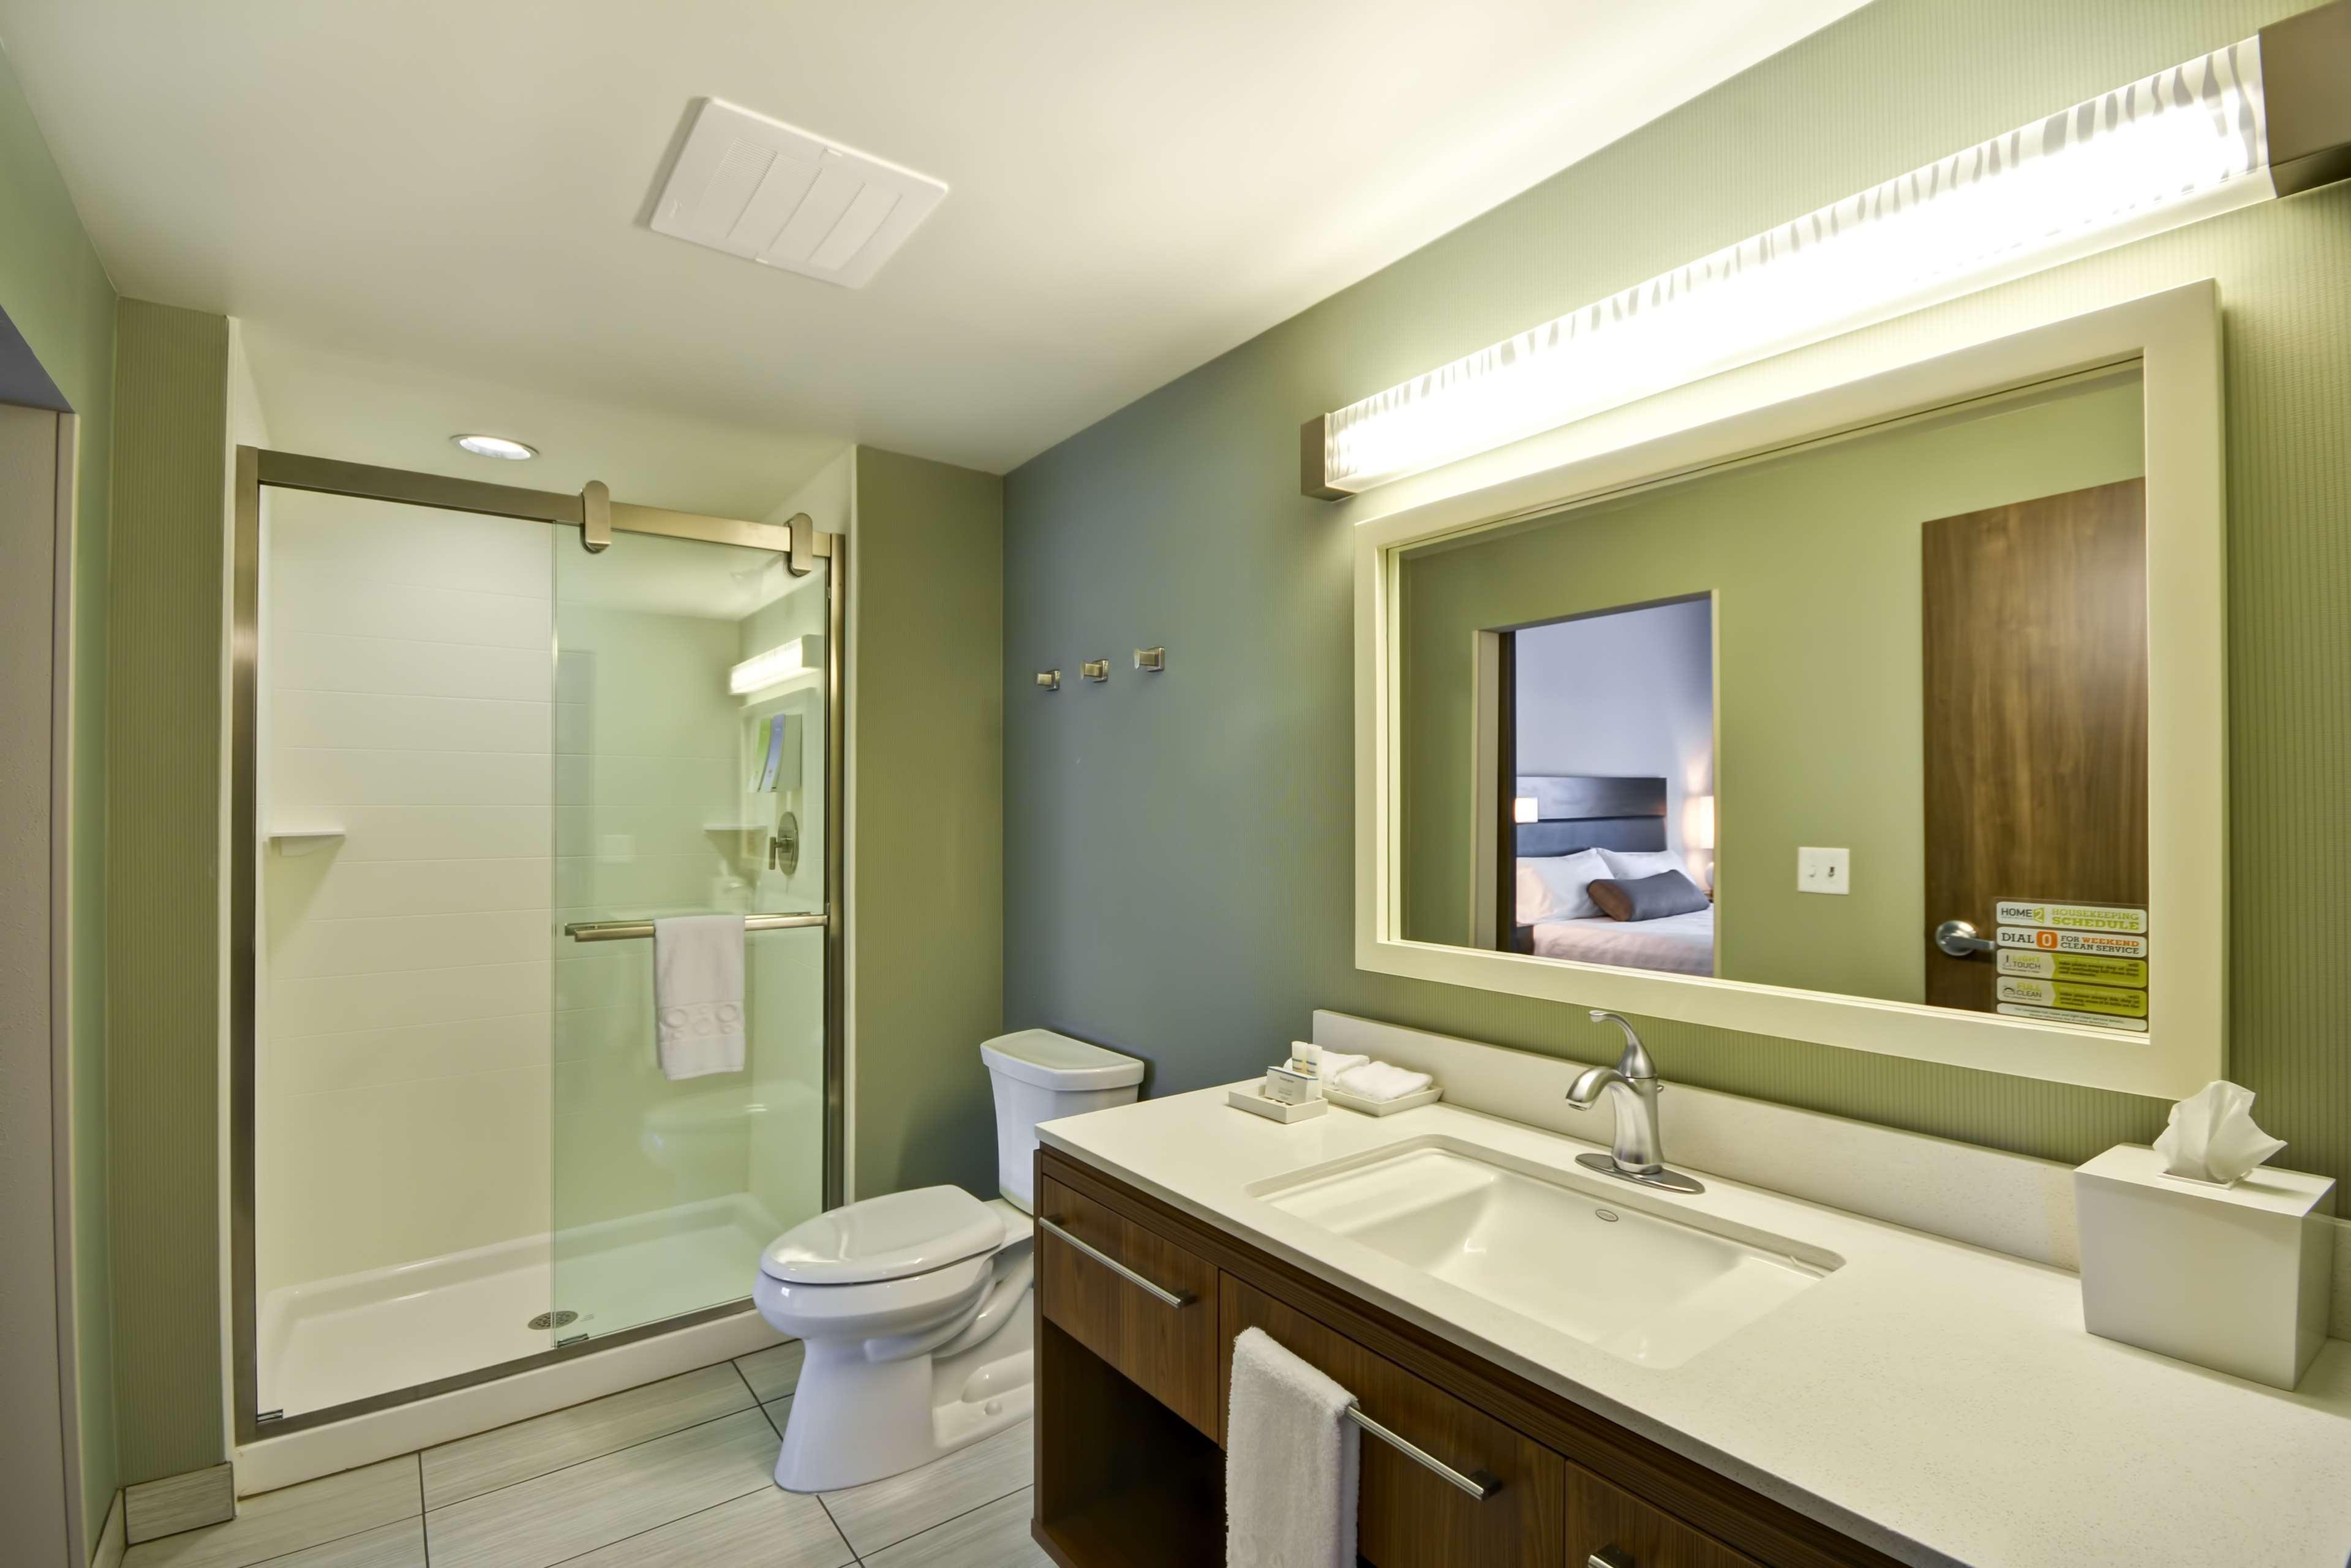 Home2 Suites by Hilton  St. Simons Island image 46